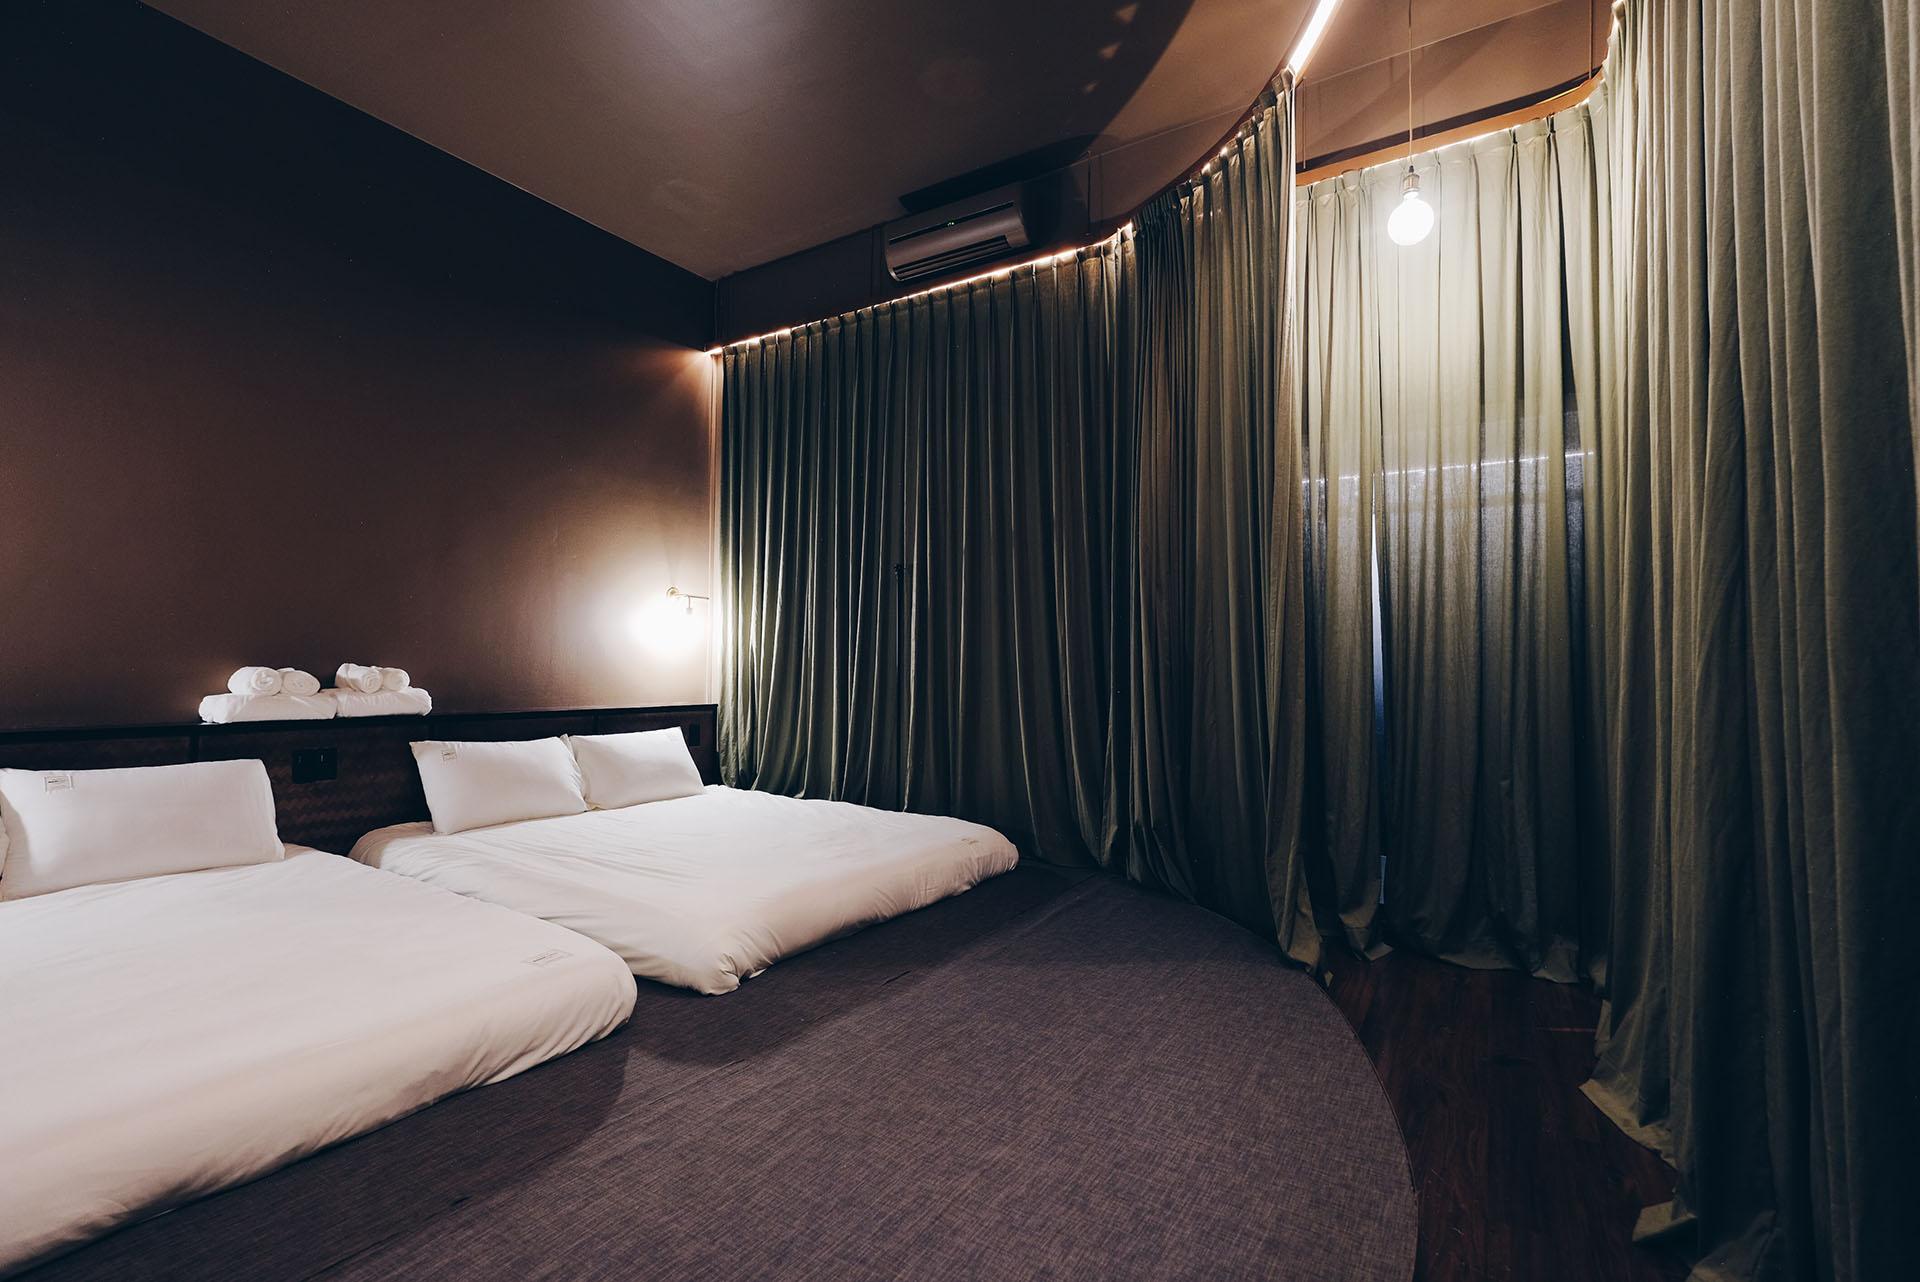 QUADRUPLE ROOMは4人まで泊まれる仕様。